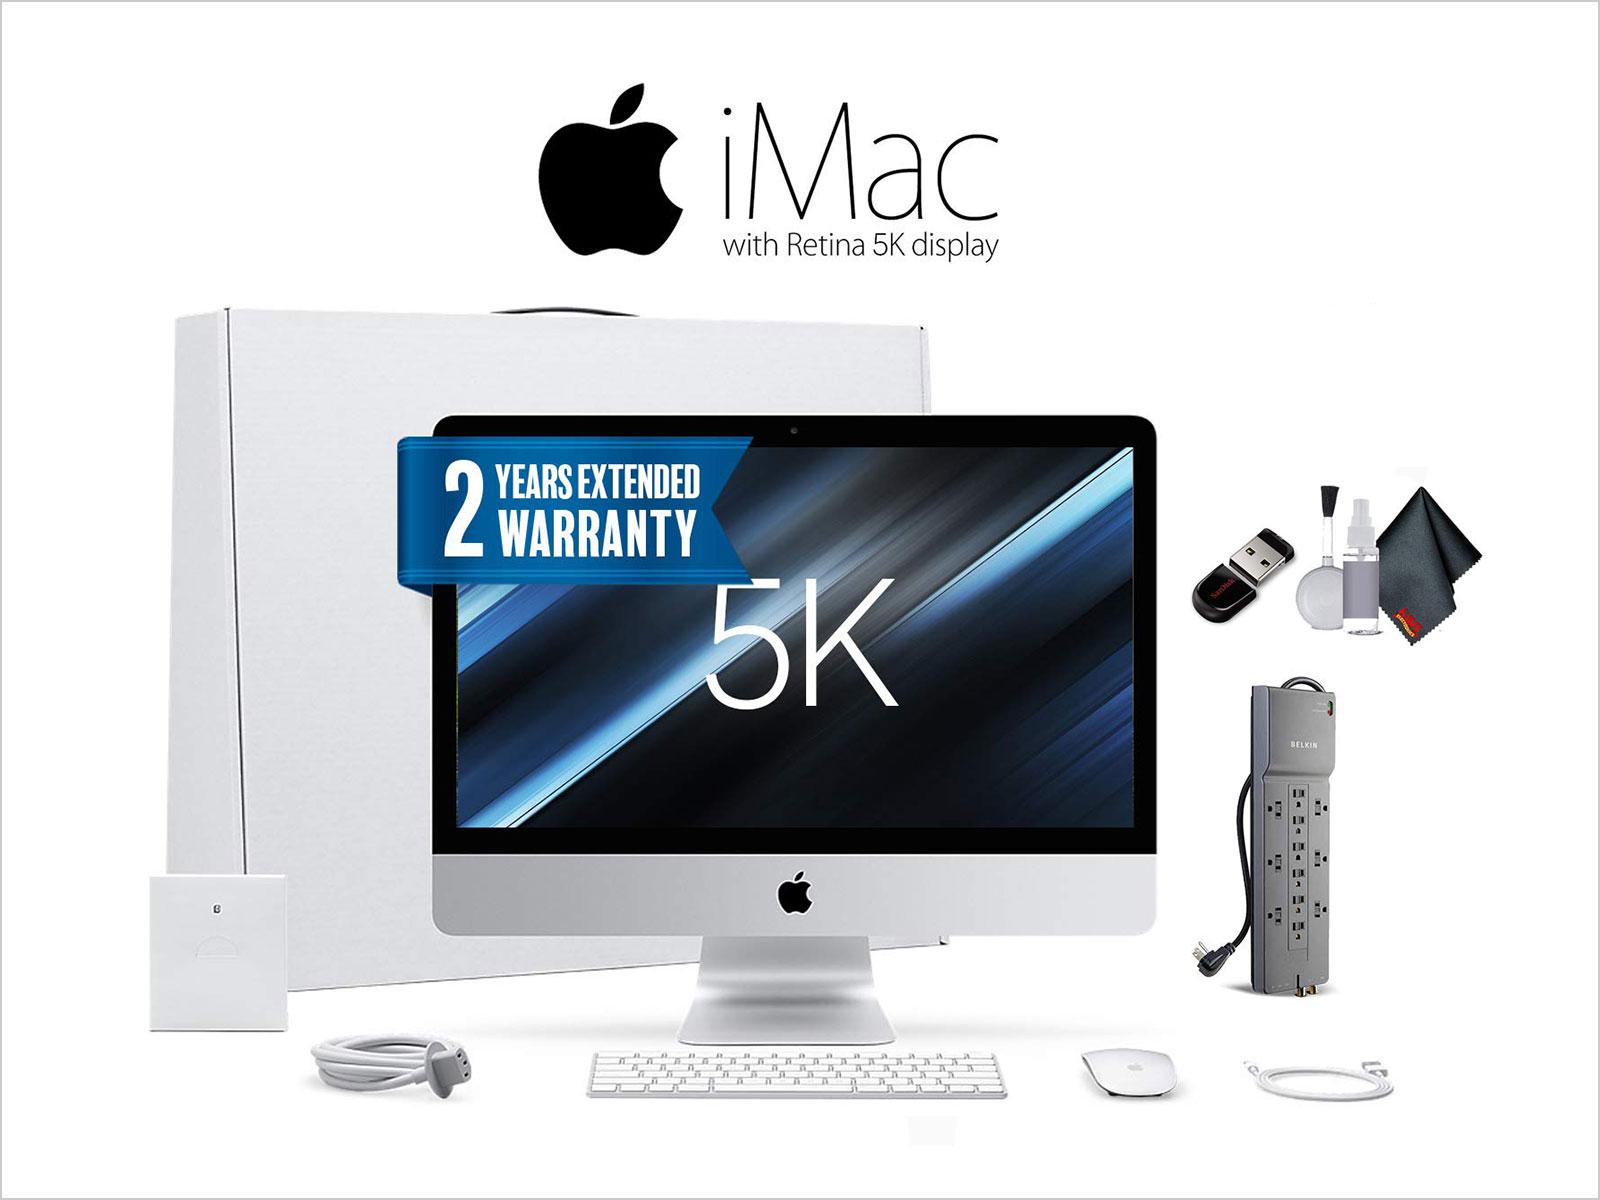 Apple-iMac-with-5K-Retina-display